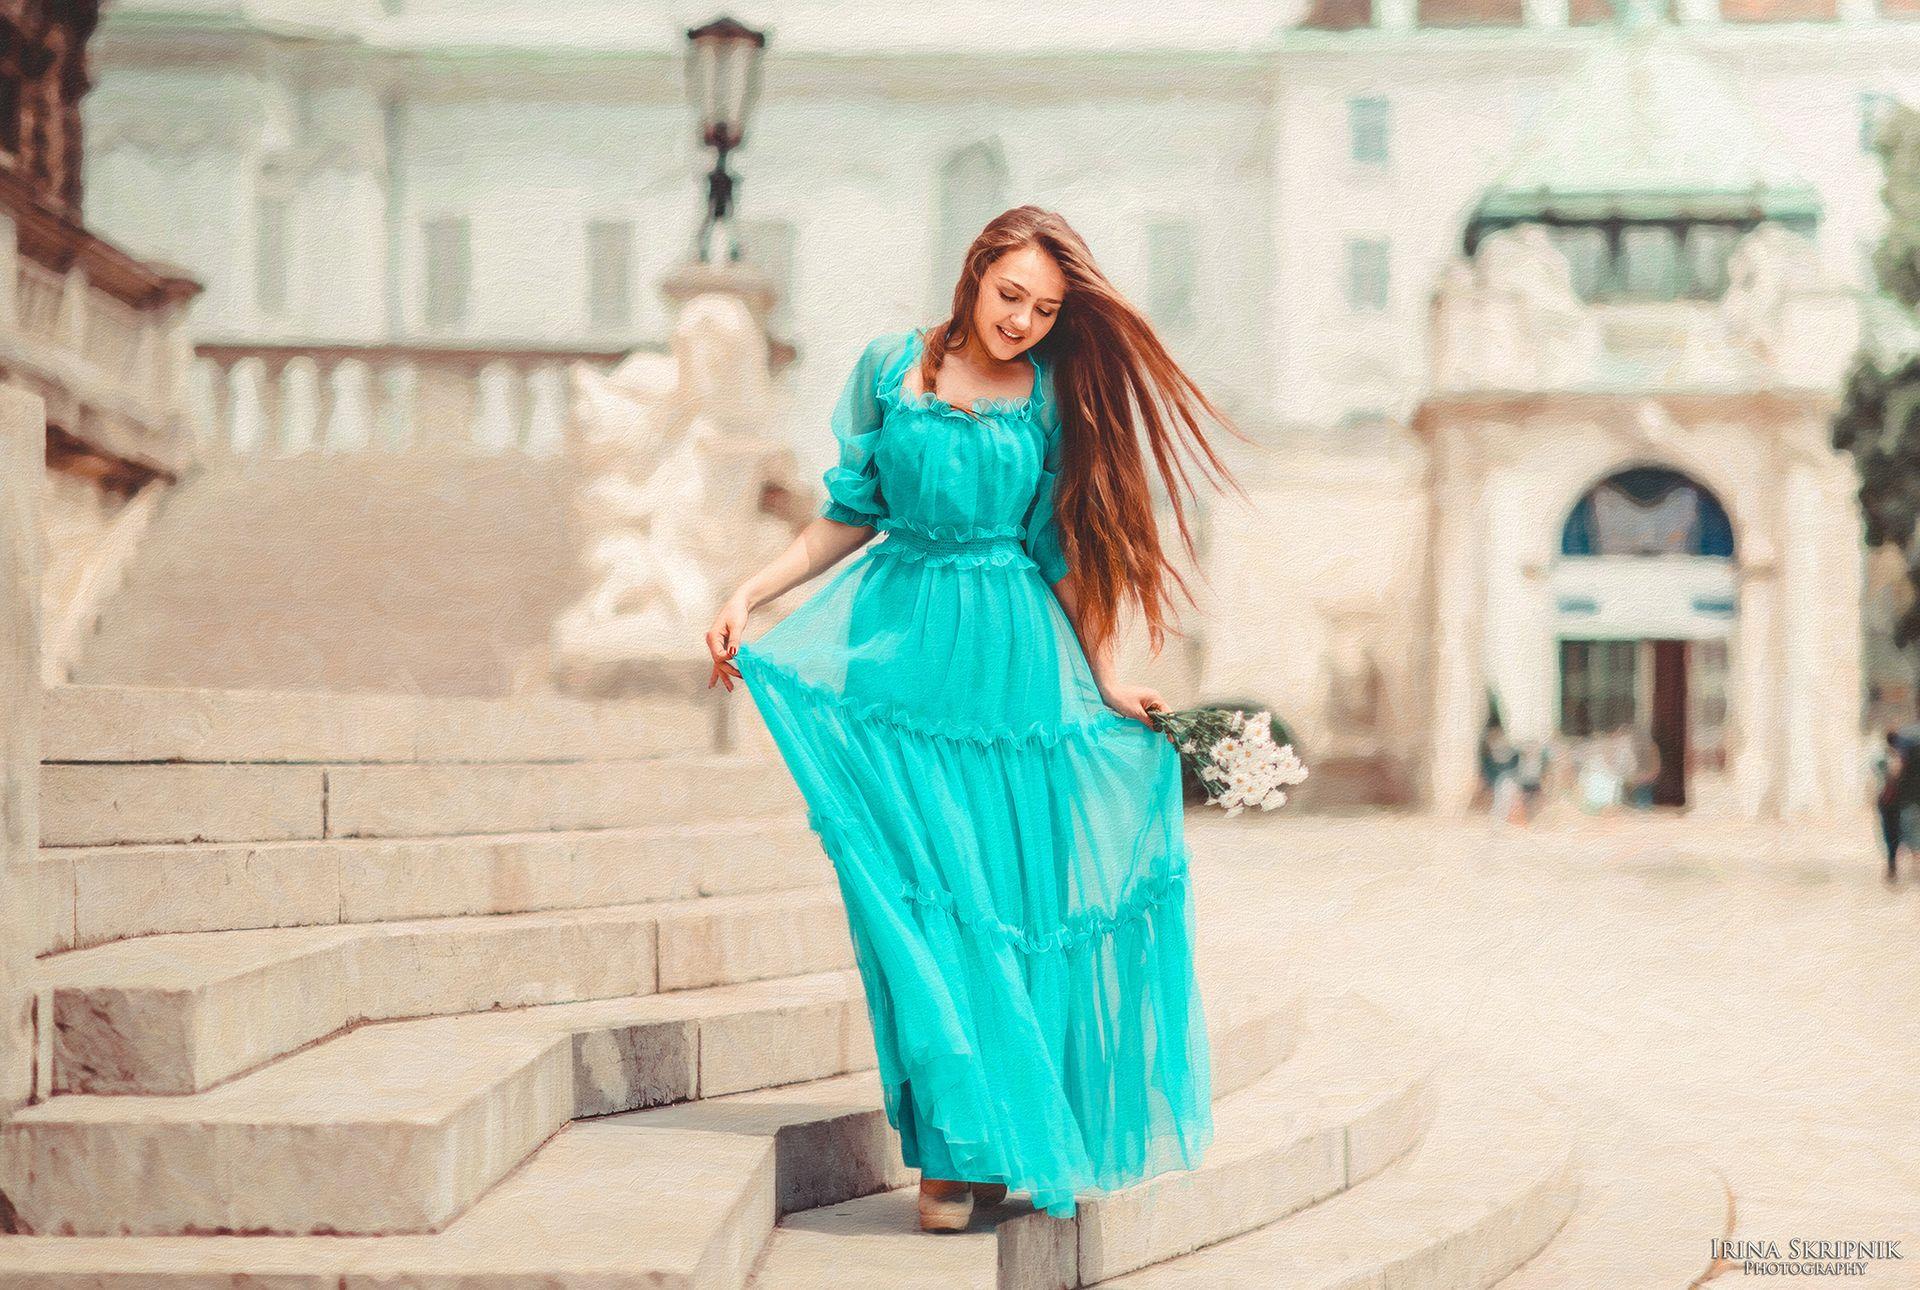 Irina Skripnik Photography 31014